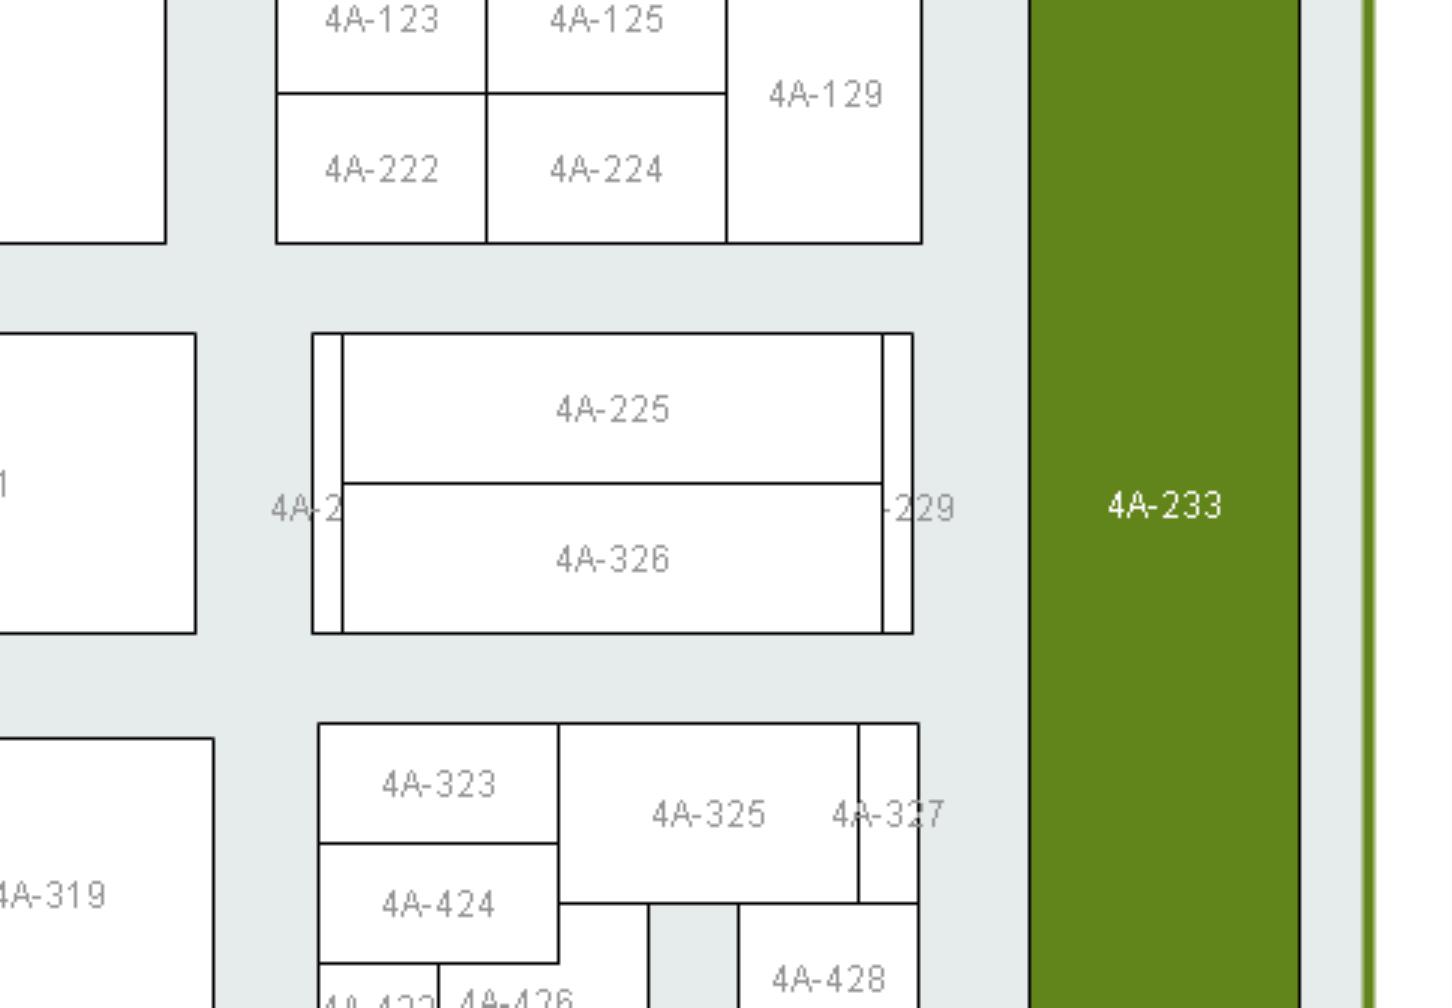 4A / 4A-233